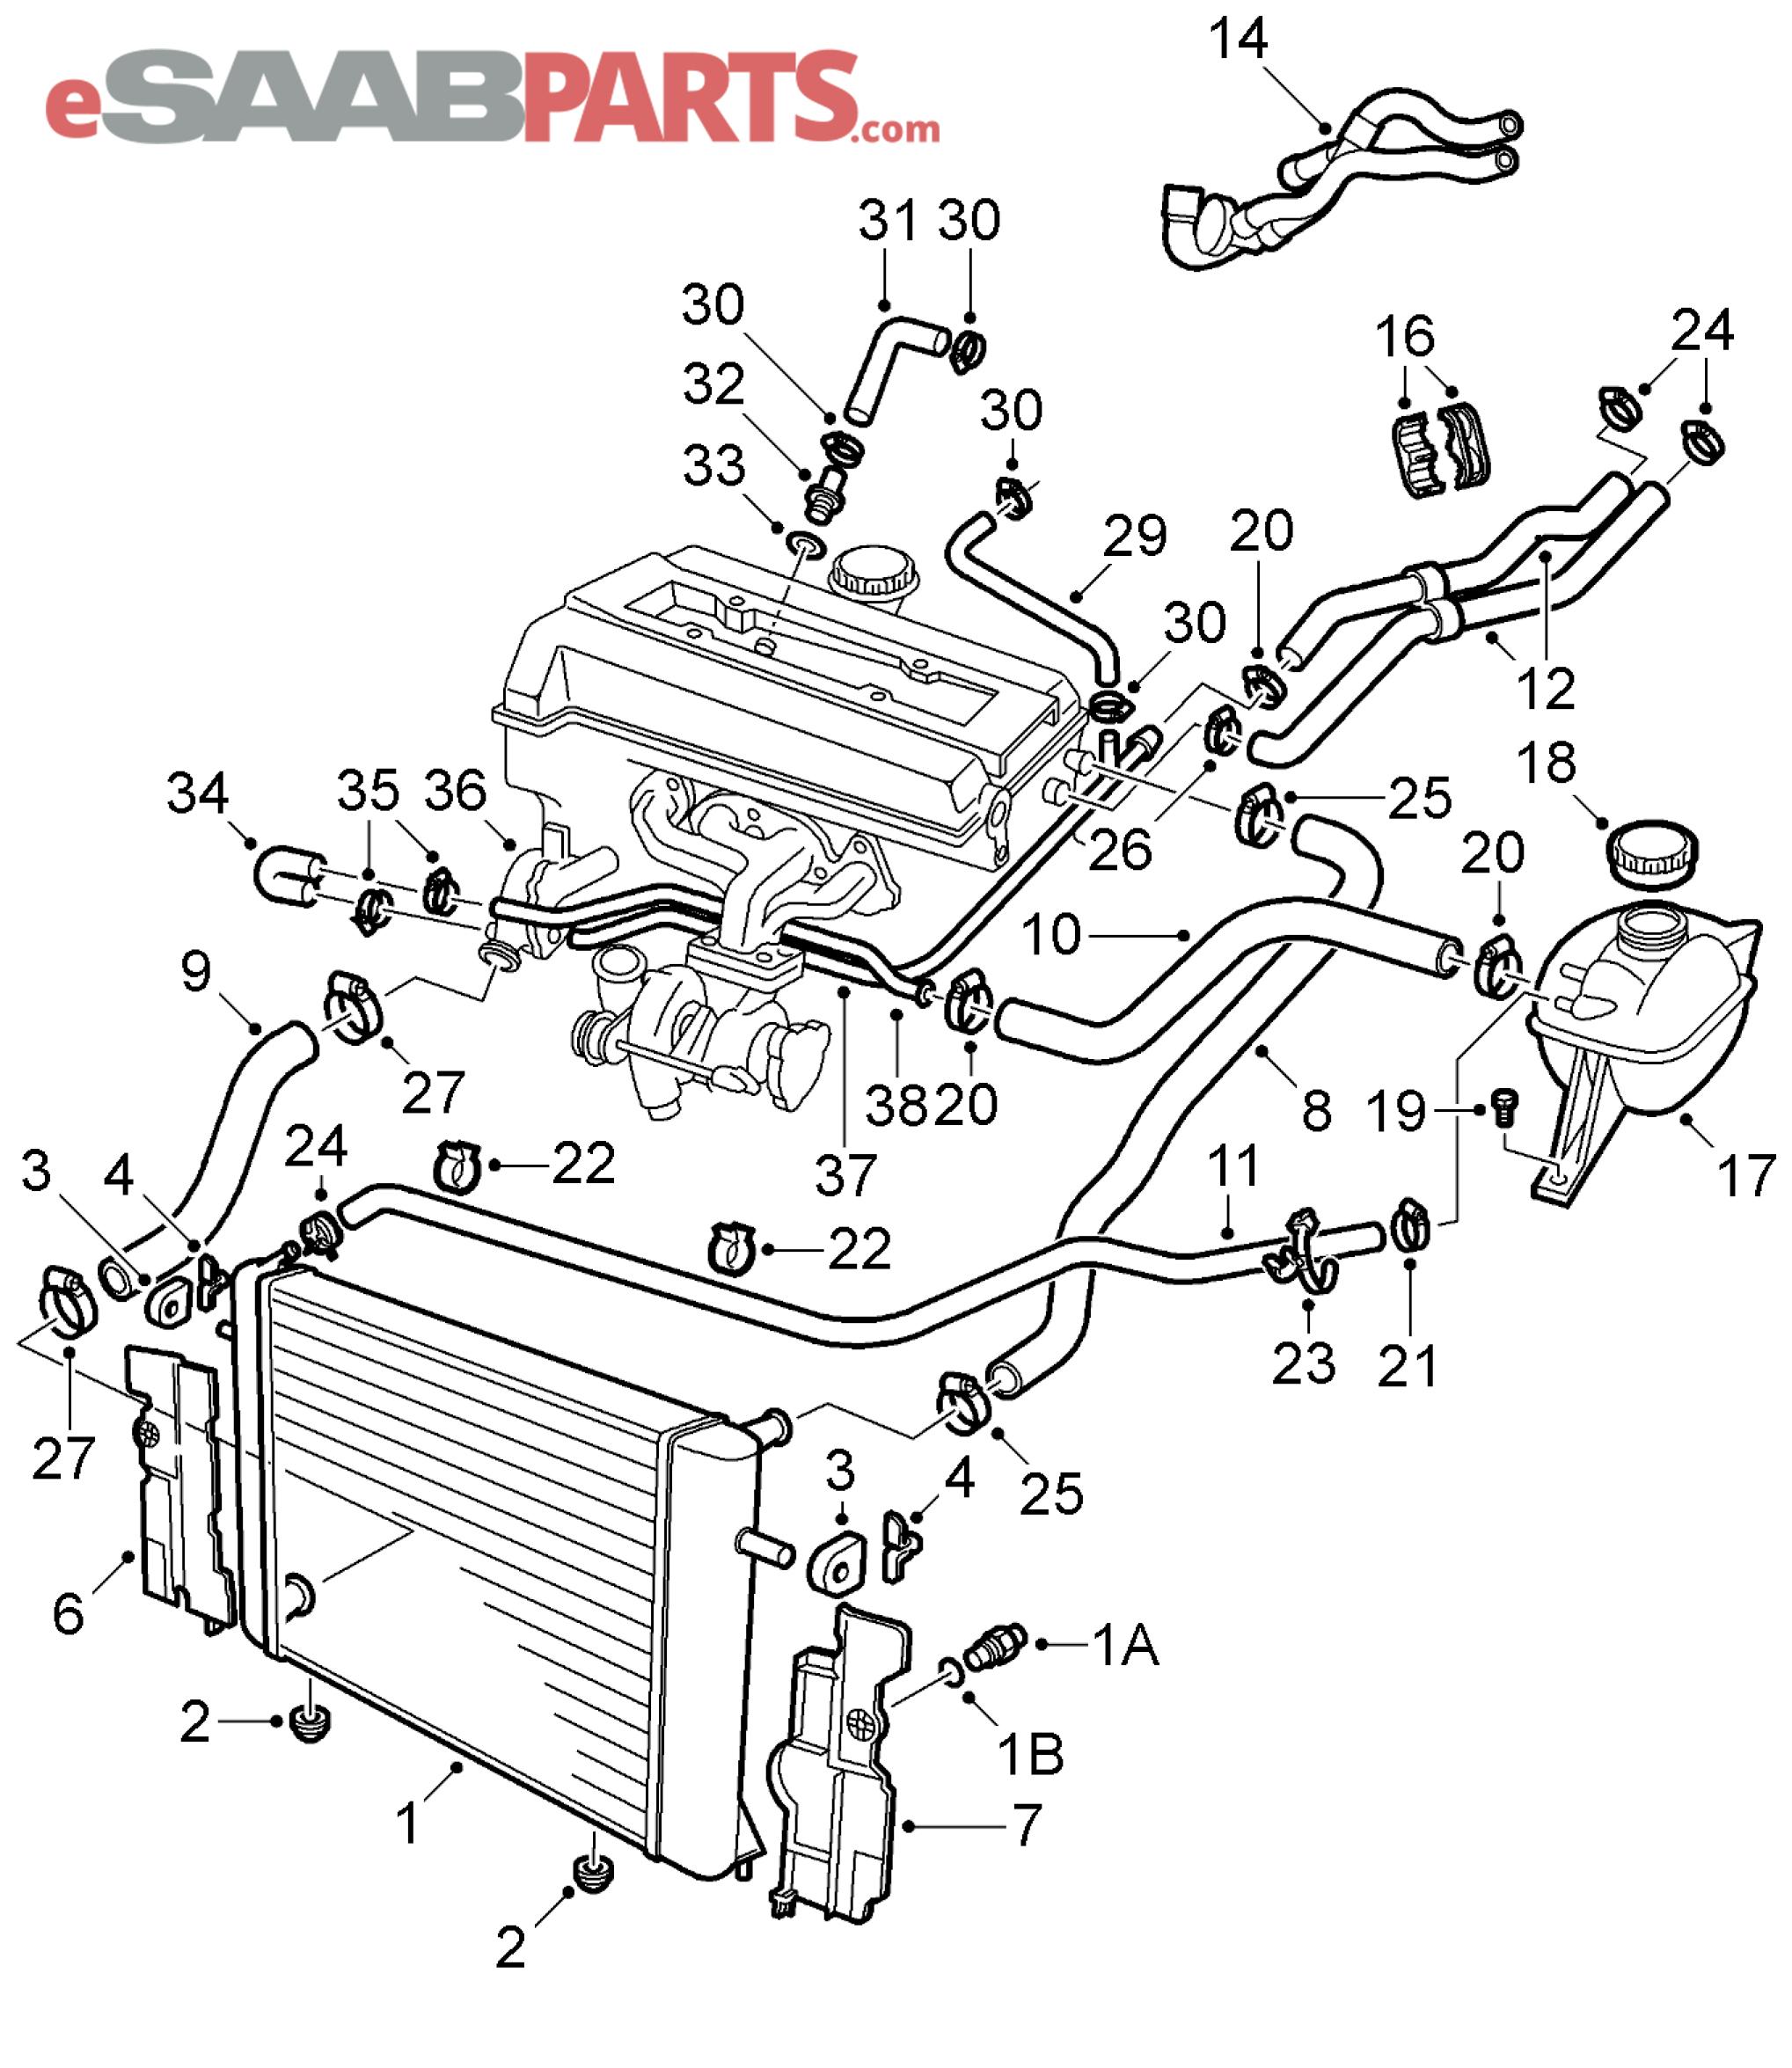 1998 saab 900 wiring diagram ws 9183  saab 9000 parts diagram schematic wiring  saab 9000 parts diagram schematic wiring